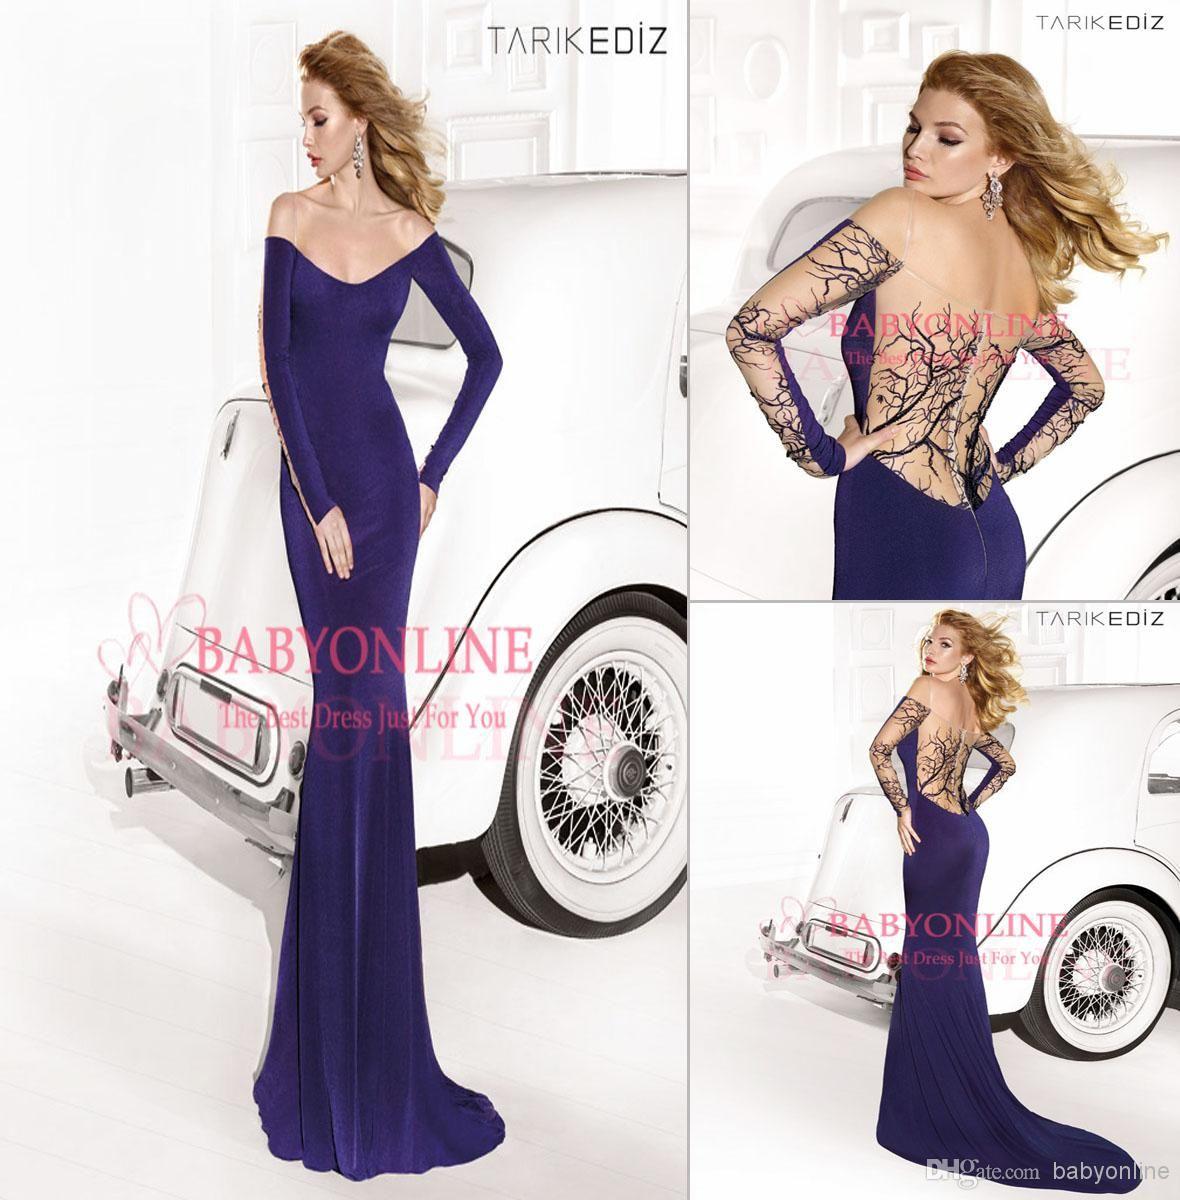 Elegant tarik ediz evening dresses sexy royal blue off shoulder